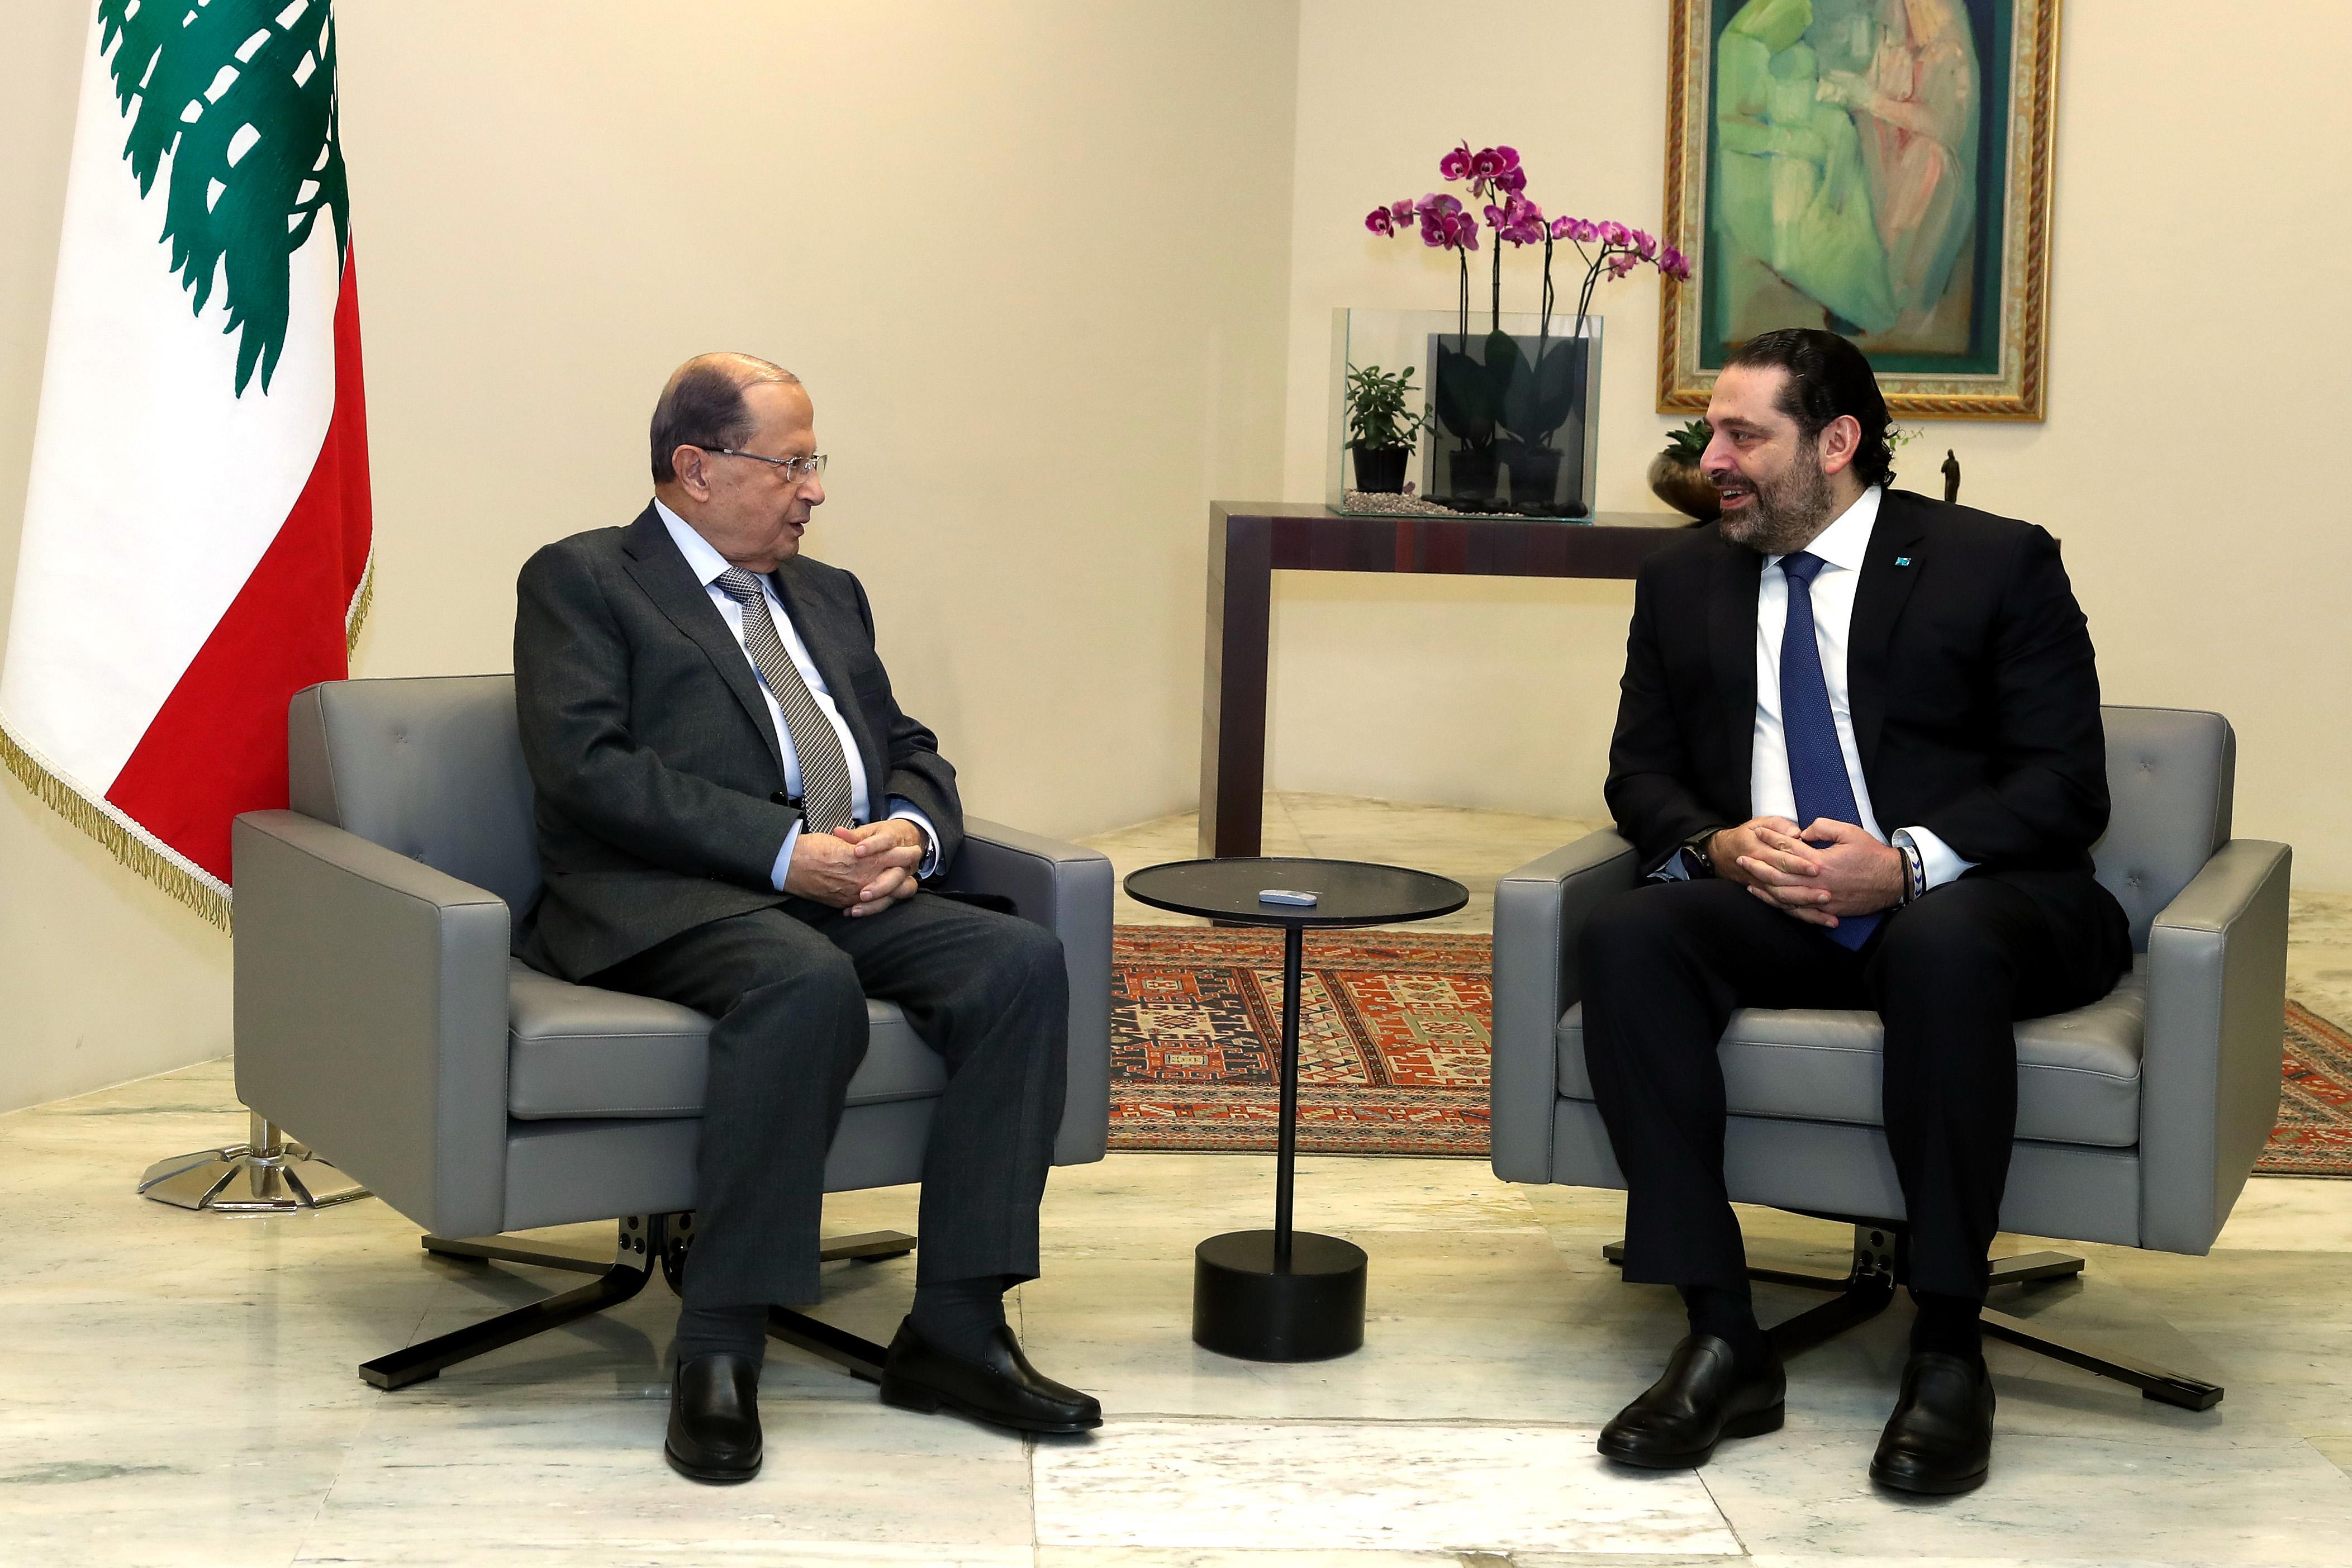 President Michel Aoun meets Pr. Minister Saad Hariri